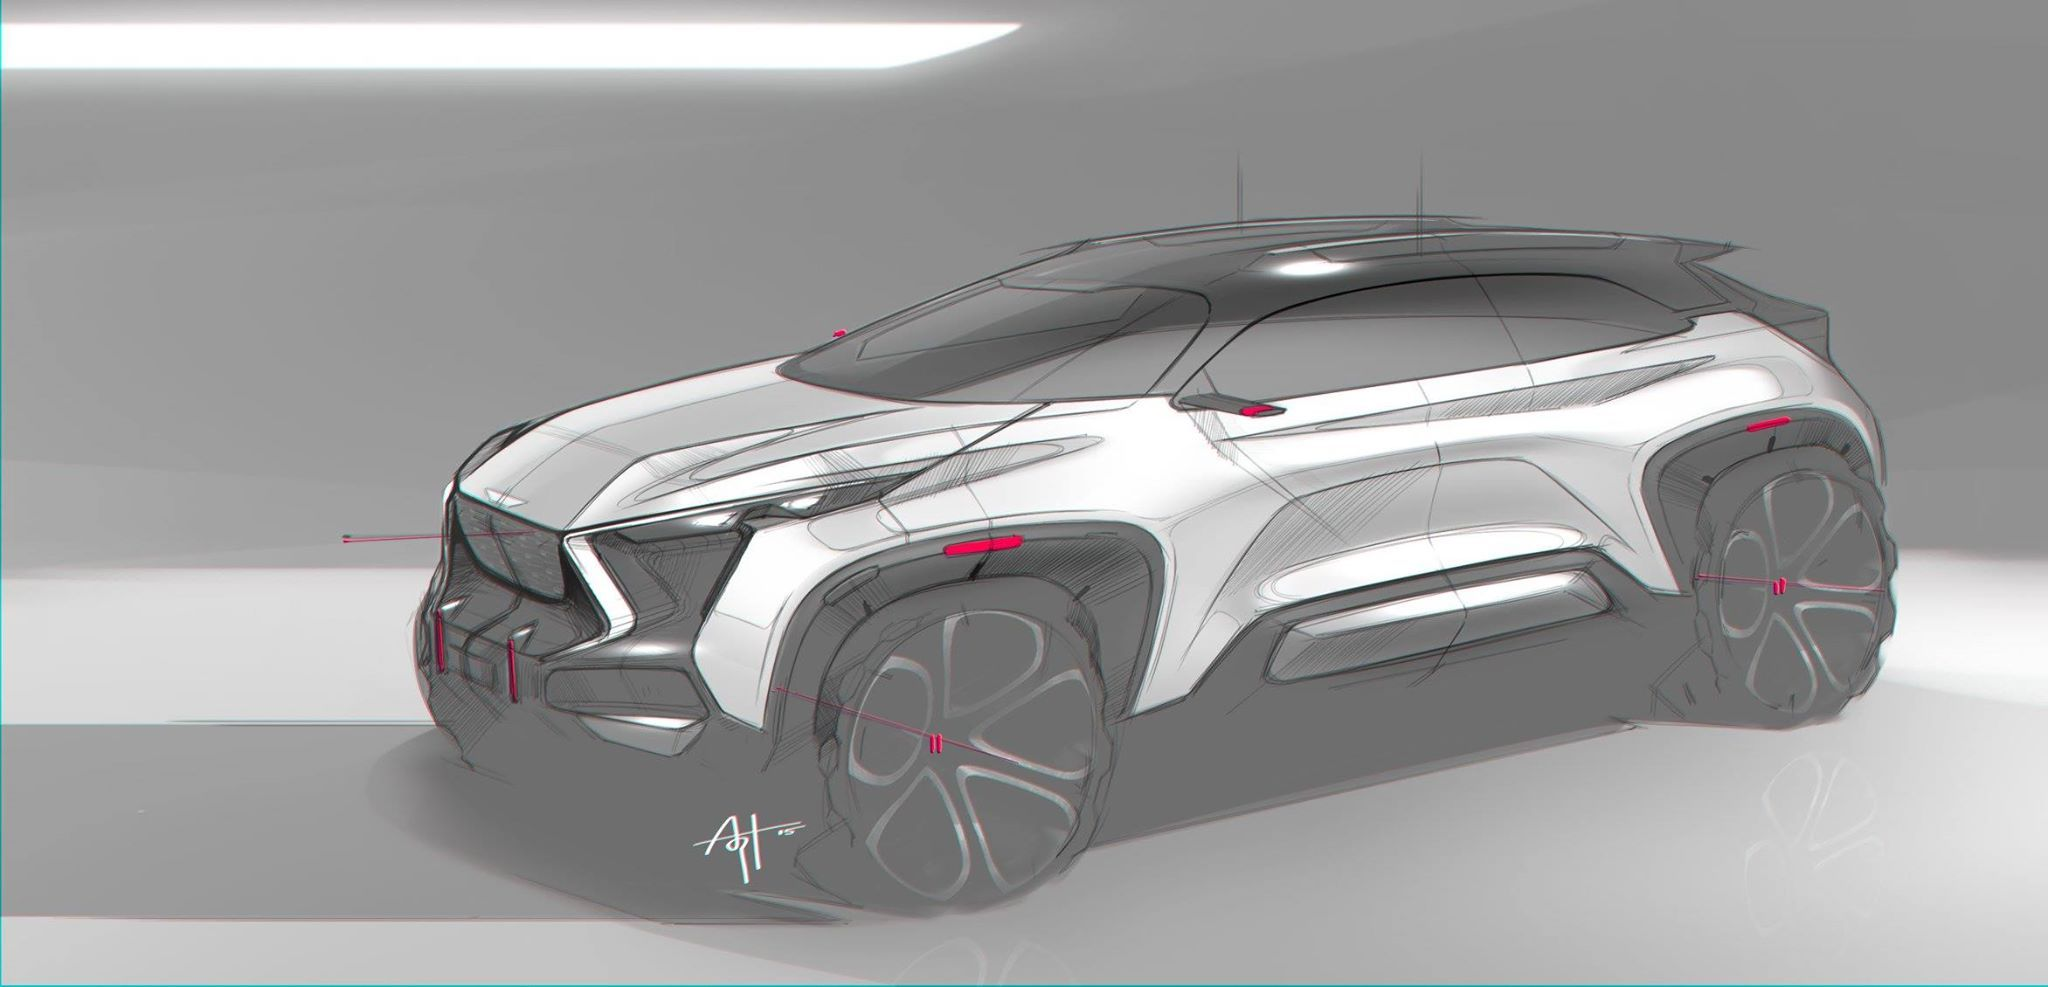 Arthur martins 2048 987 sketches voiture design et vehicule - Croquis voiture ...